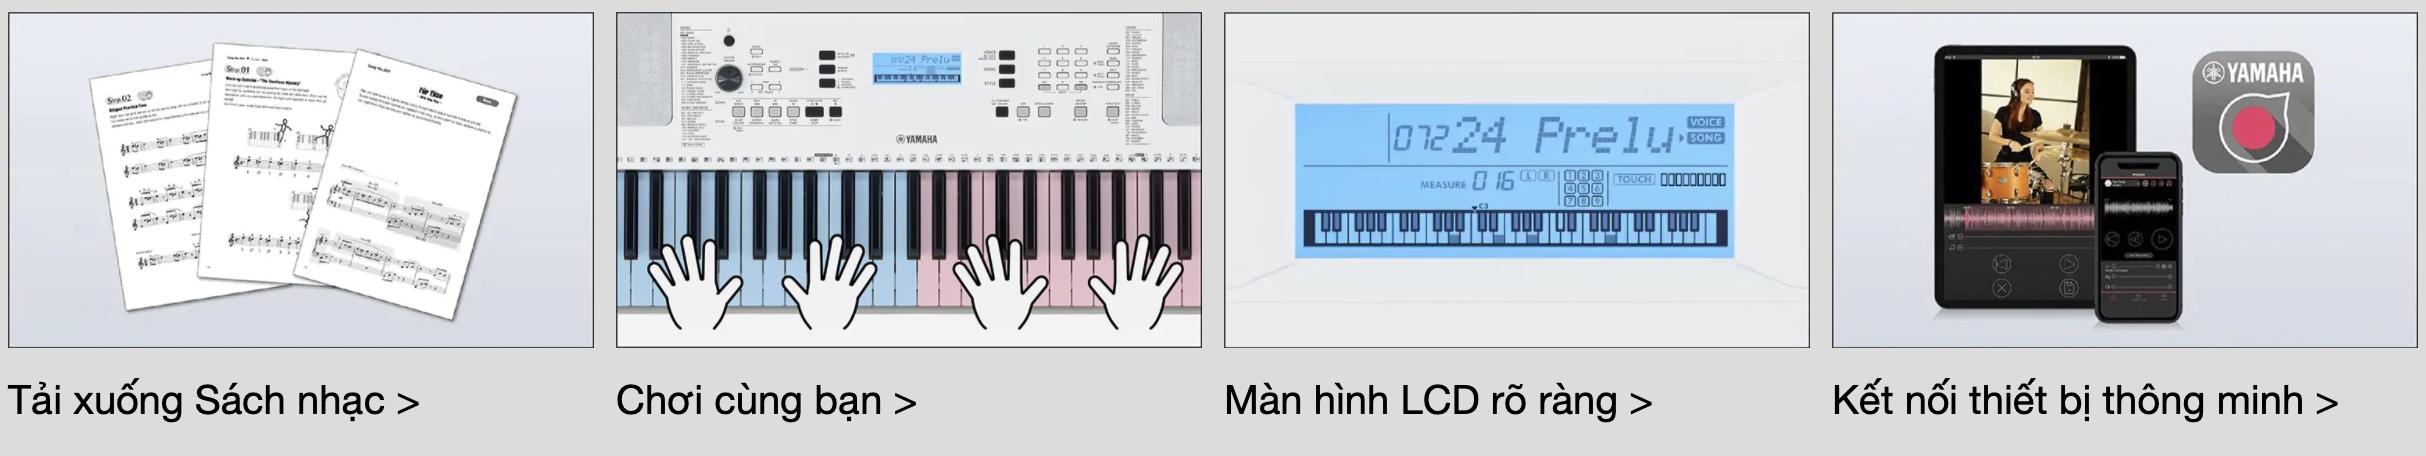 àn organ Yamaha EZ 300 4